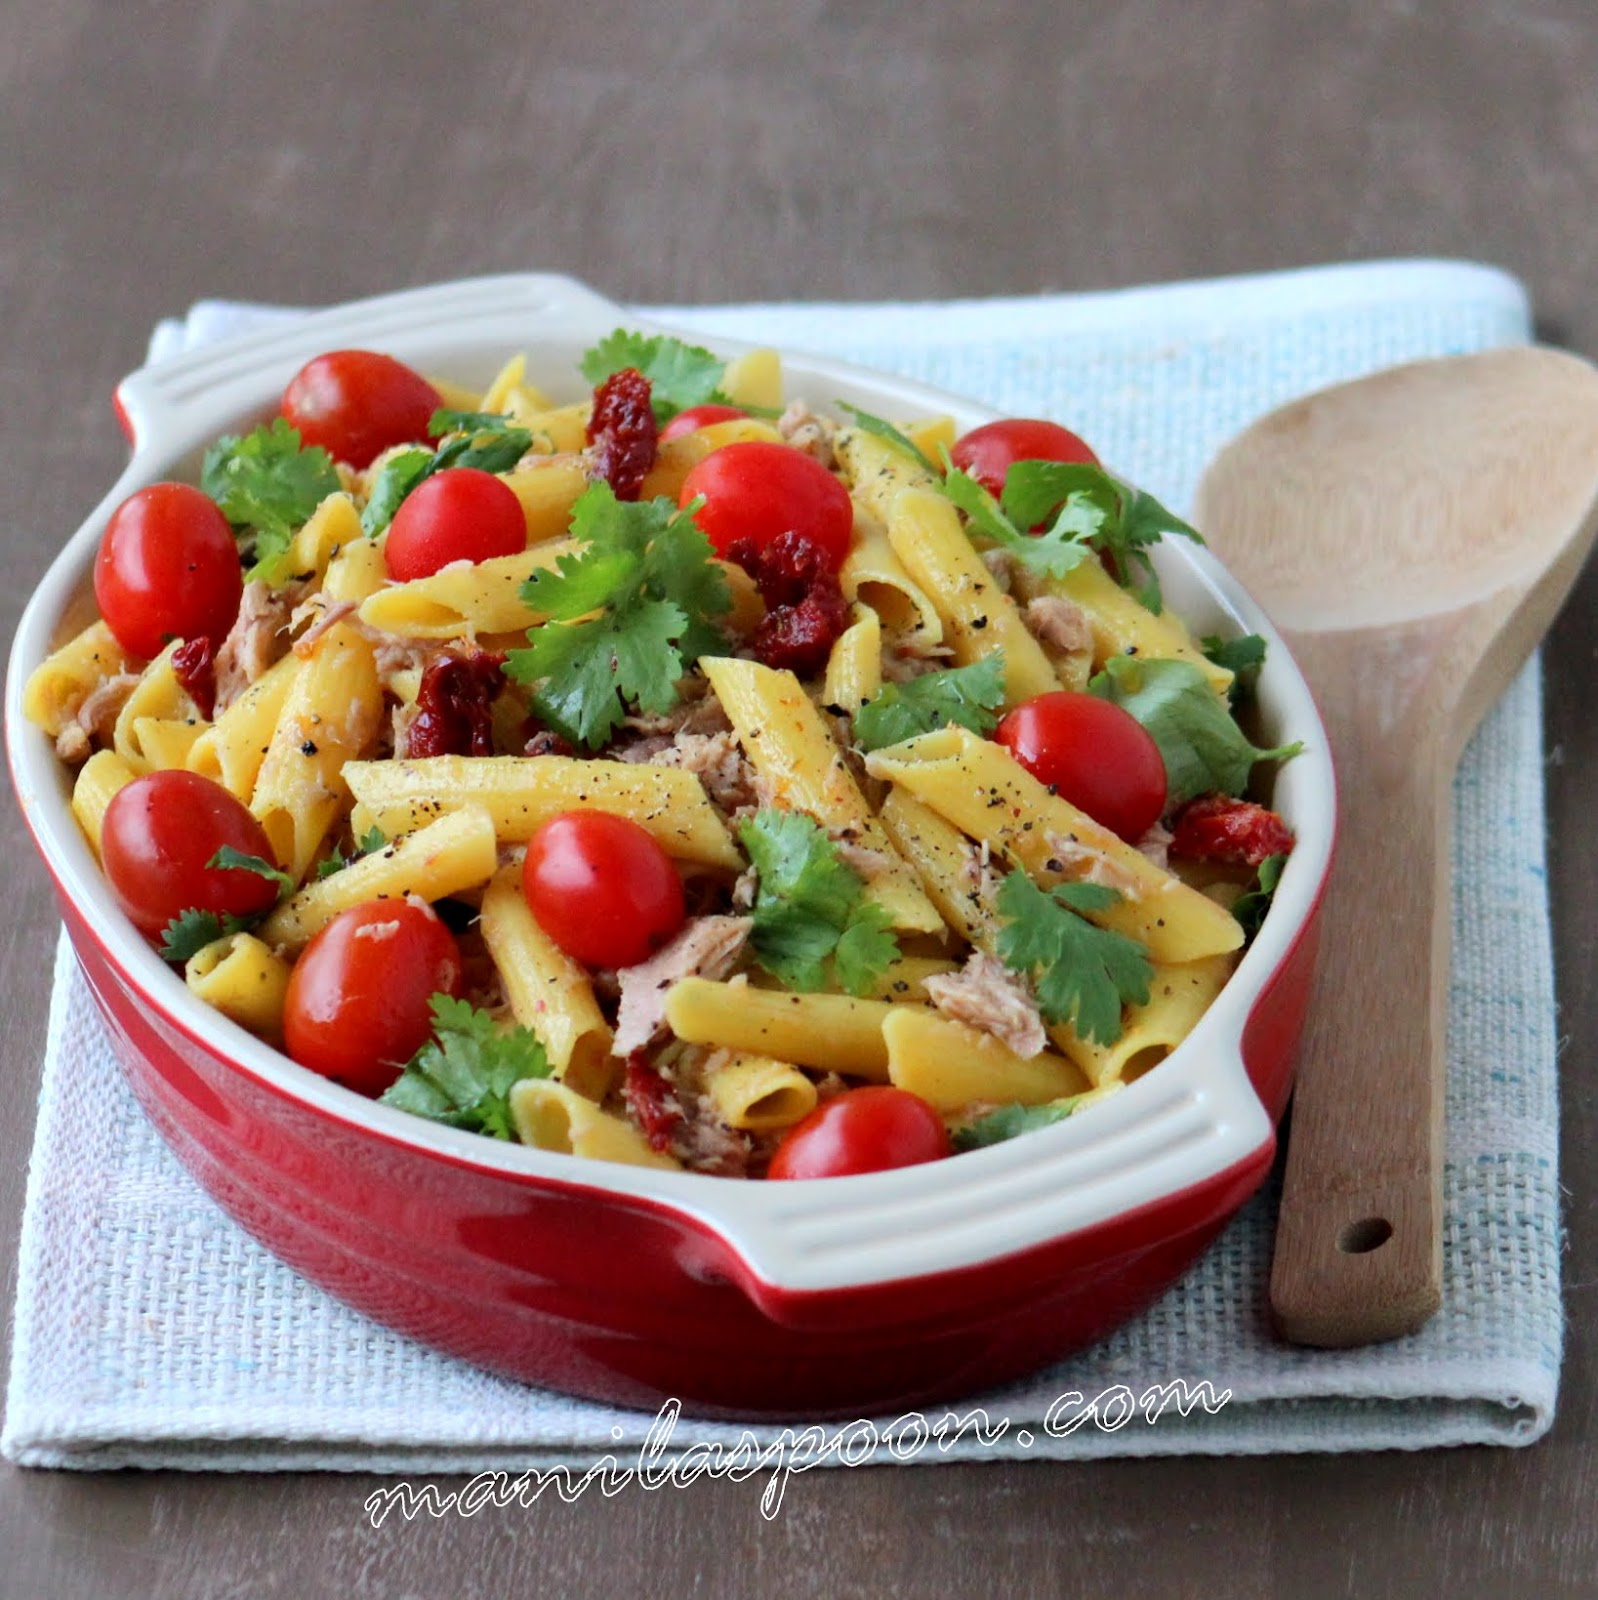 Gluten-free Tuna Pasta Salad